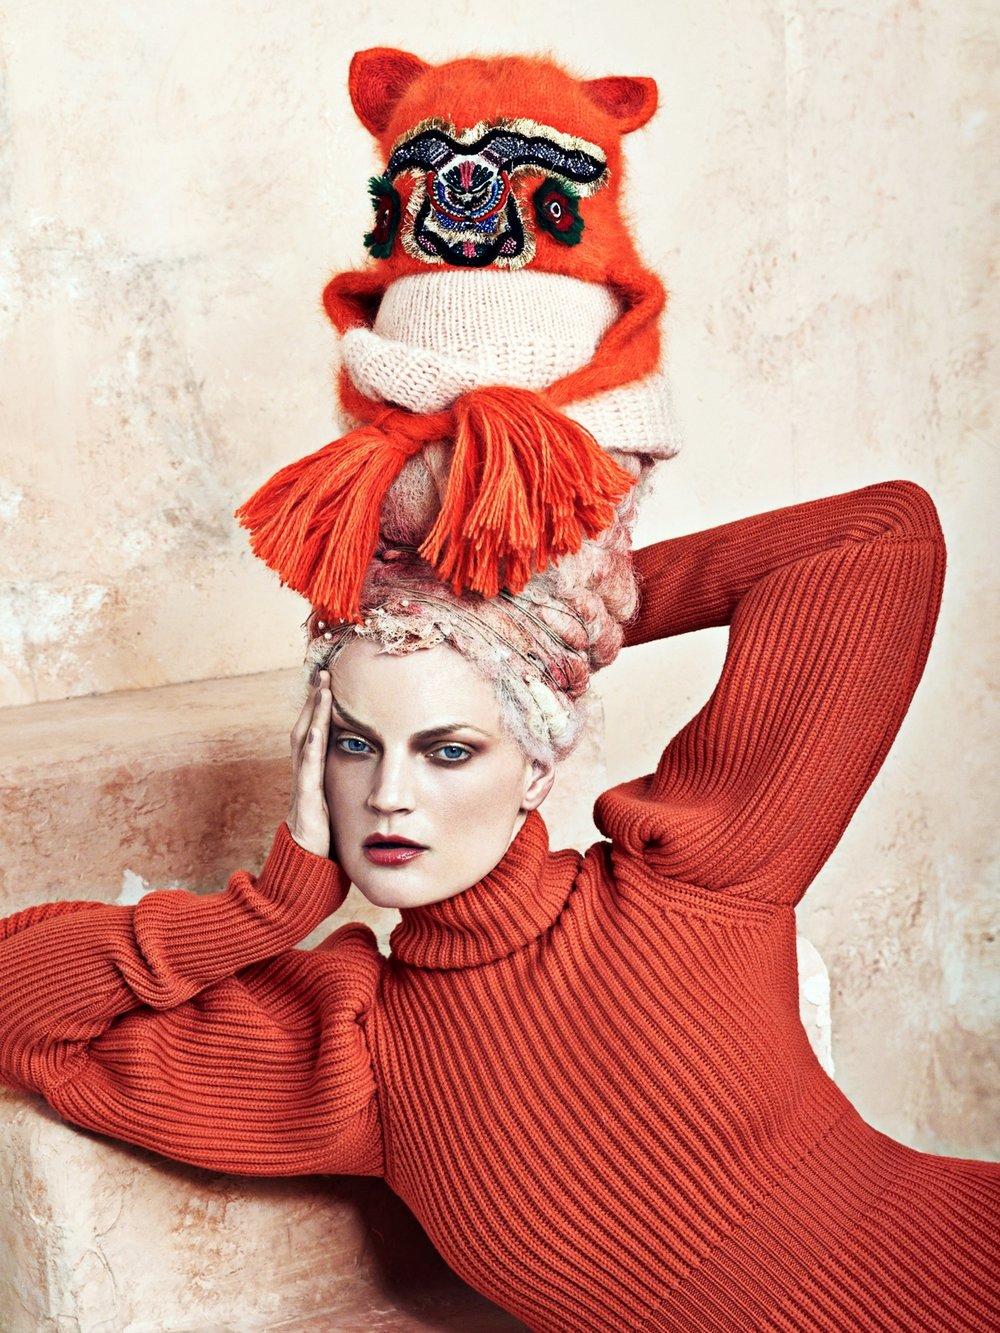 cr-fashion-book-no9-fall-winter-2016-guinevere-van-seenus-by-bjorn-iooss-07.jpg